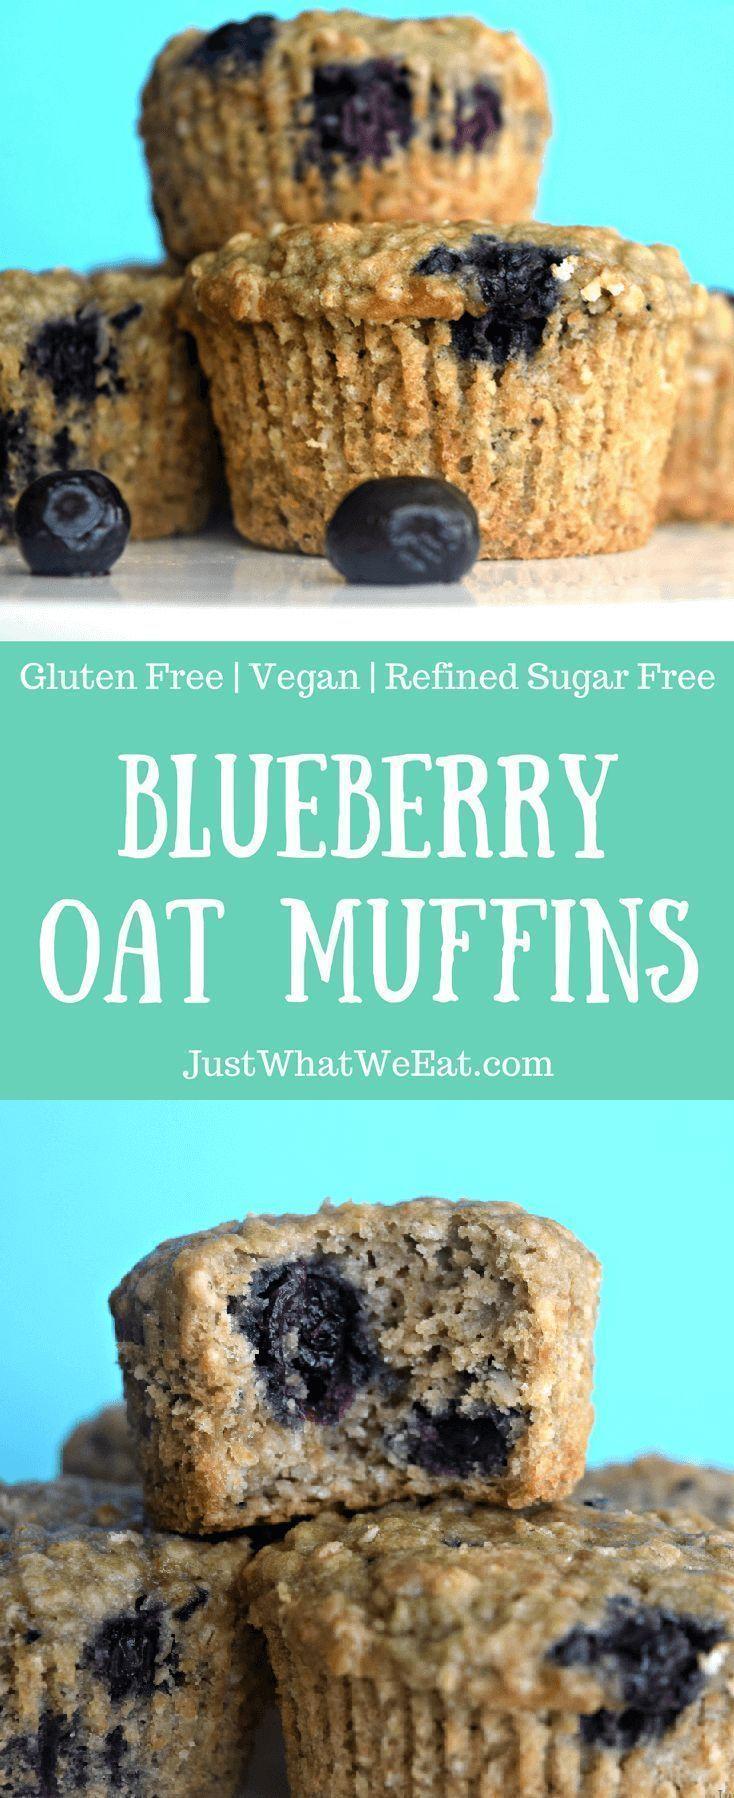 Blueberry Oat Muffins - Gluten Free, Vegan, & Refined Sugar Free #glutenfreebreakfasts